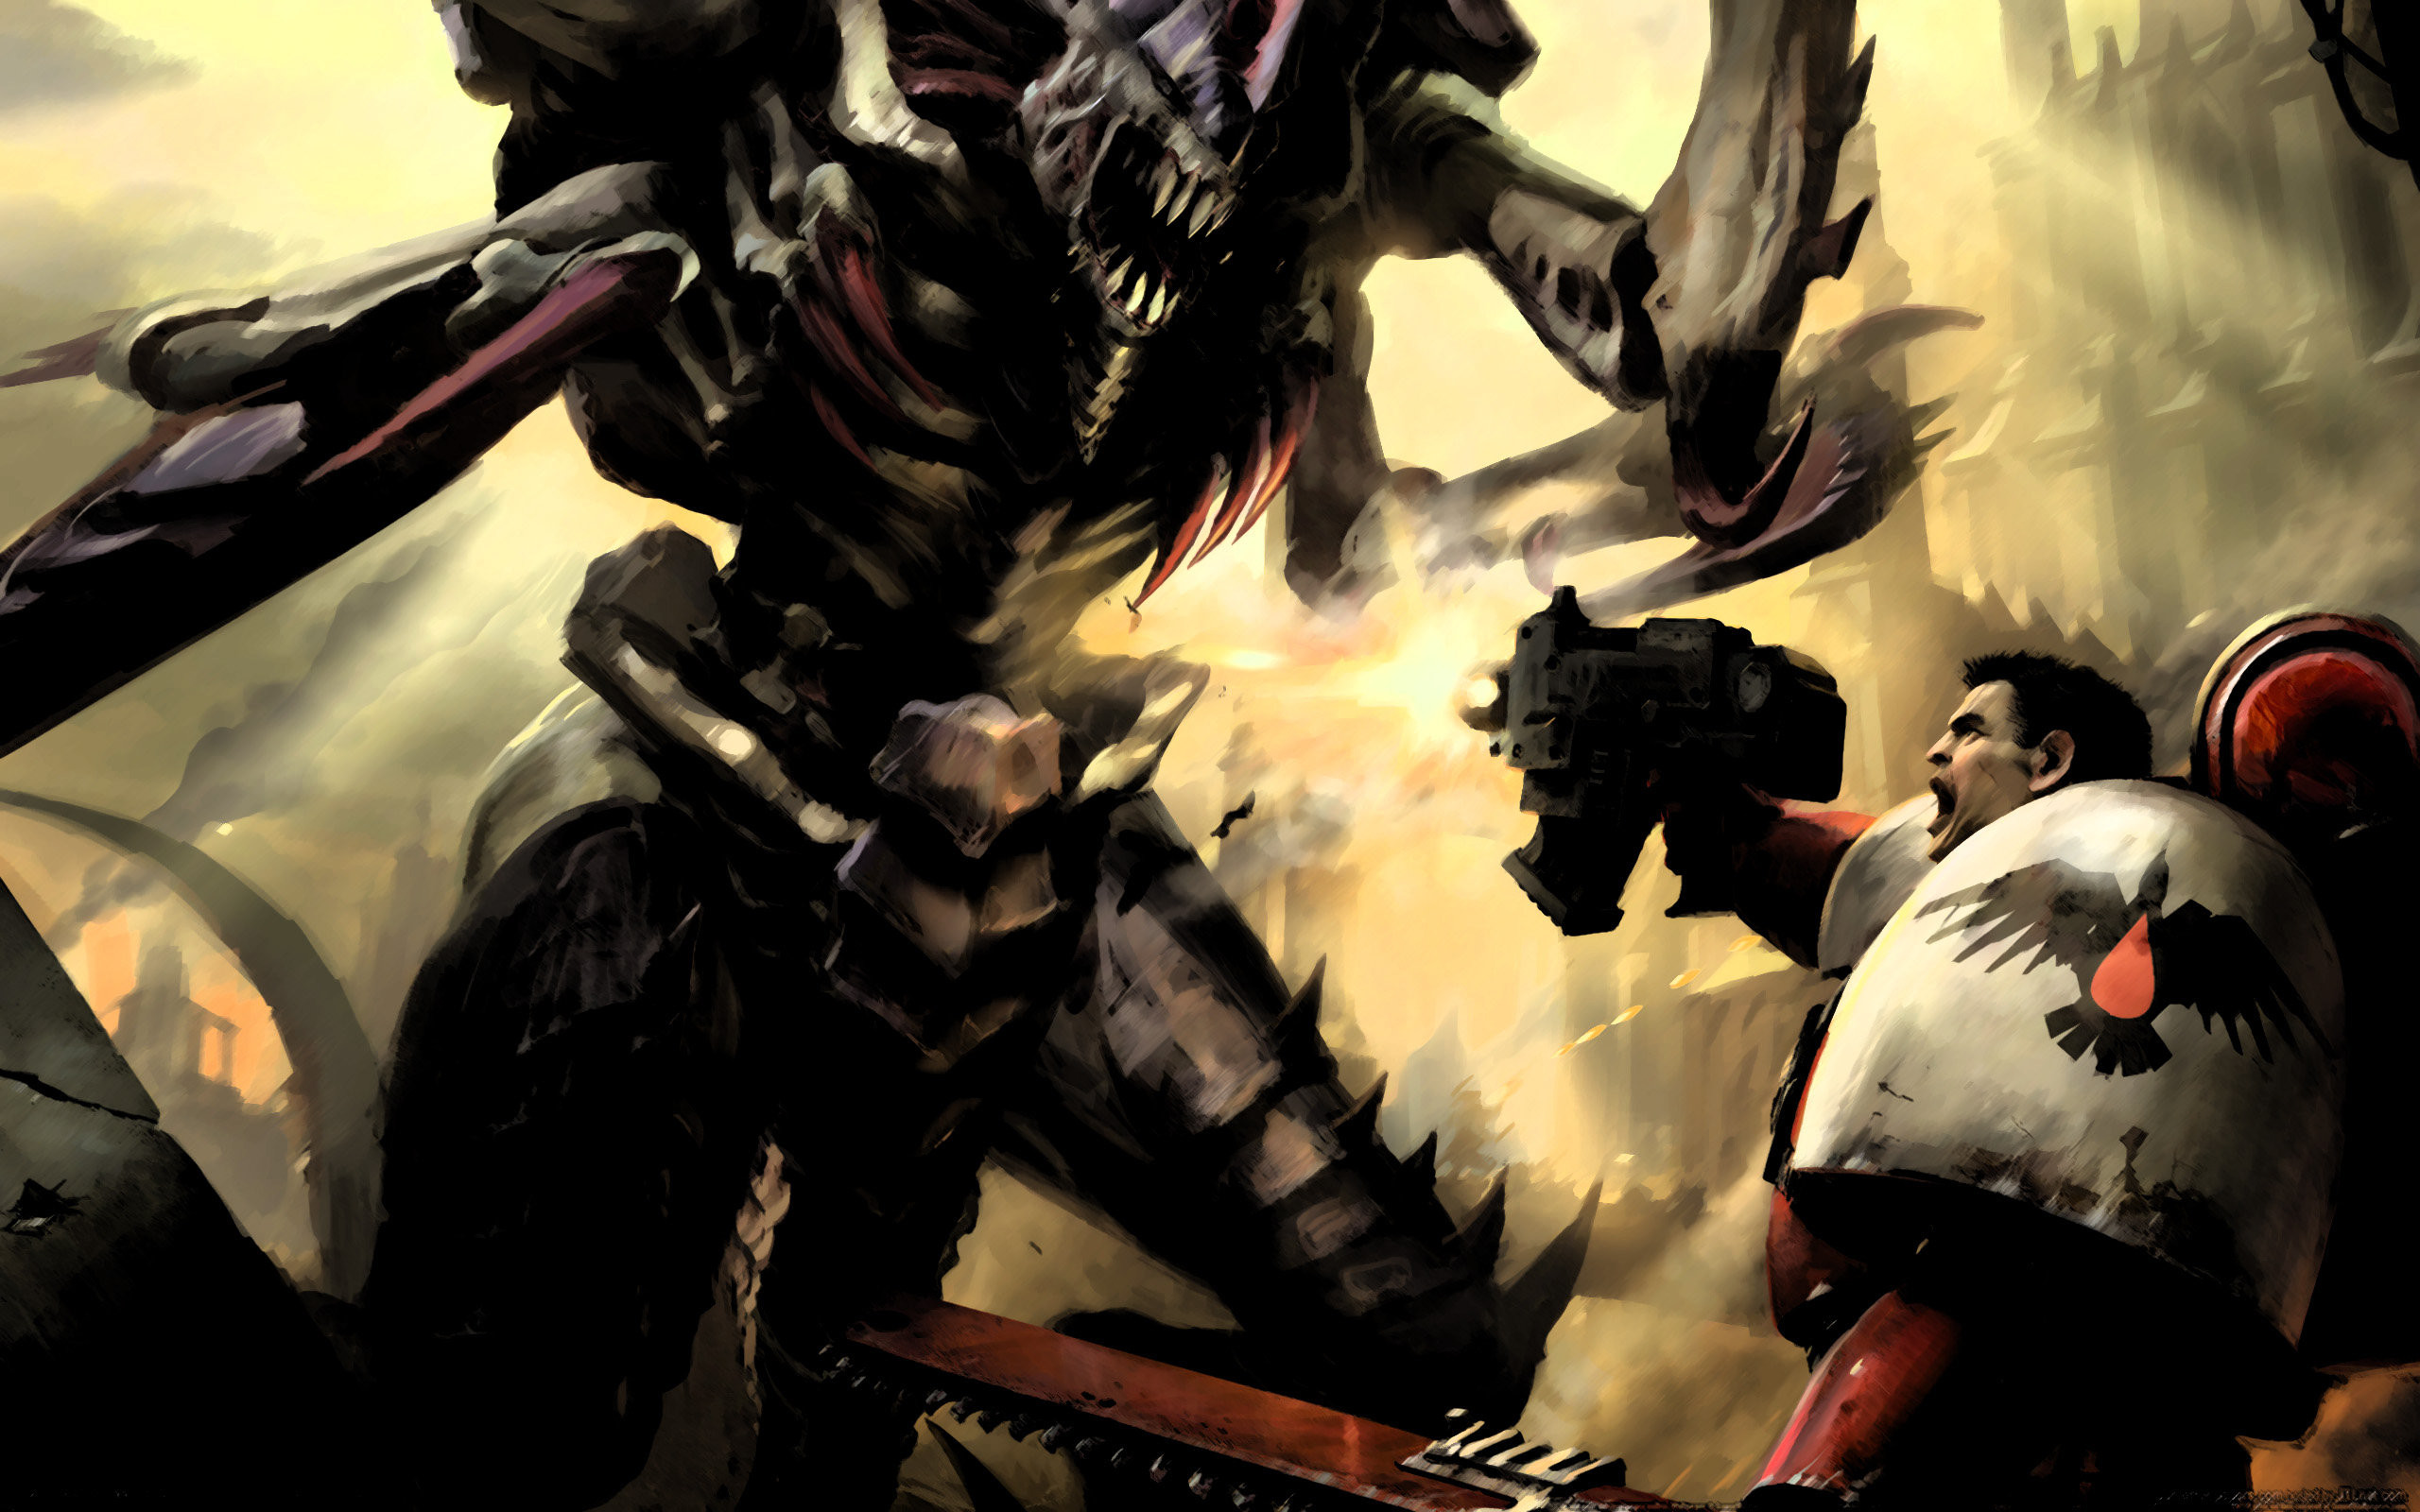 Warhammer 40k death company wallpaper - 2560x1600 Warhammer 40k Black Templar Wallpaper 2560x1600 1550 Wallpaperup